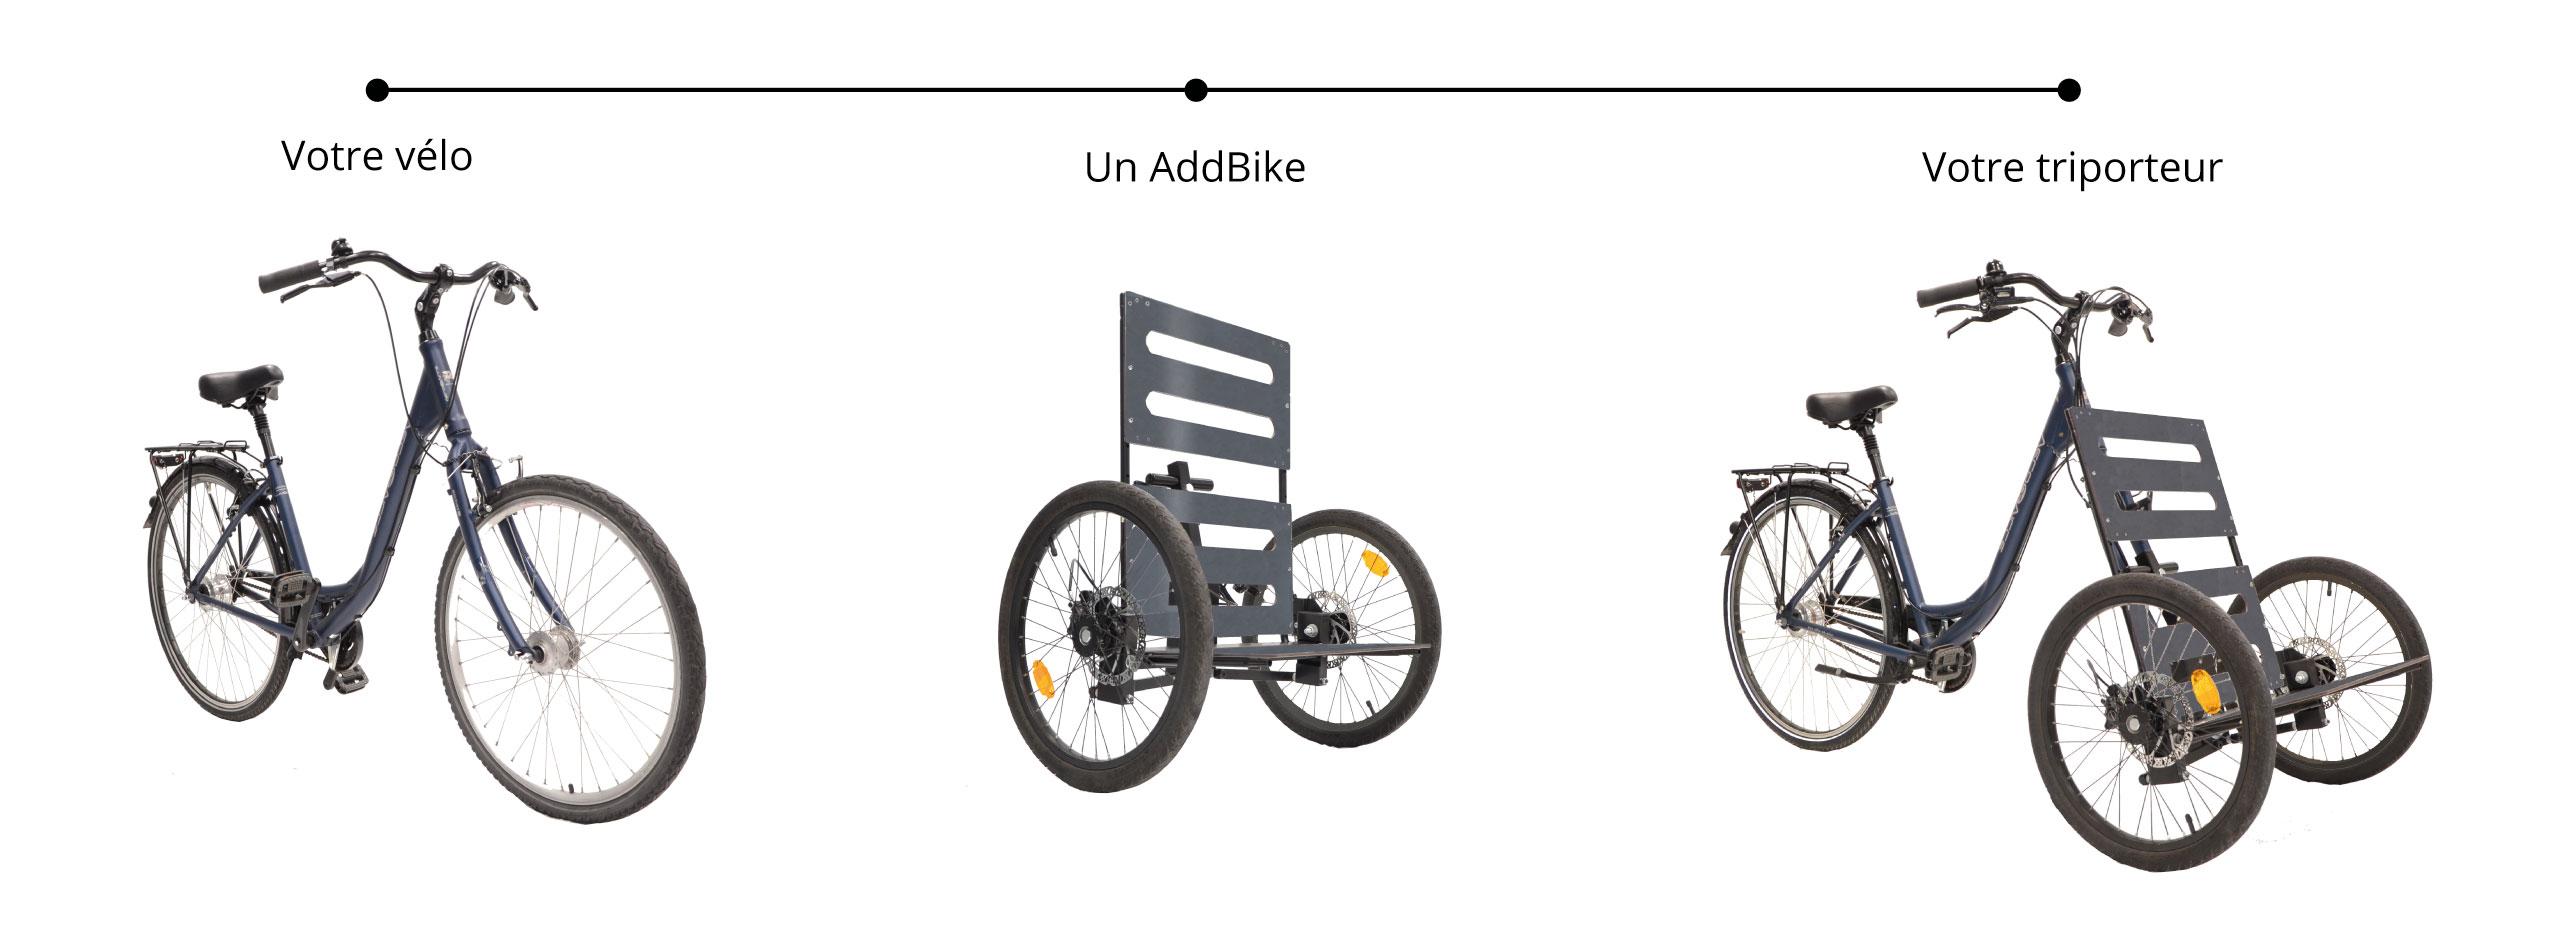 Transformation facile de vélo classique à vélo cargo